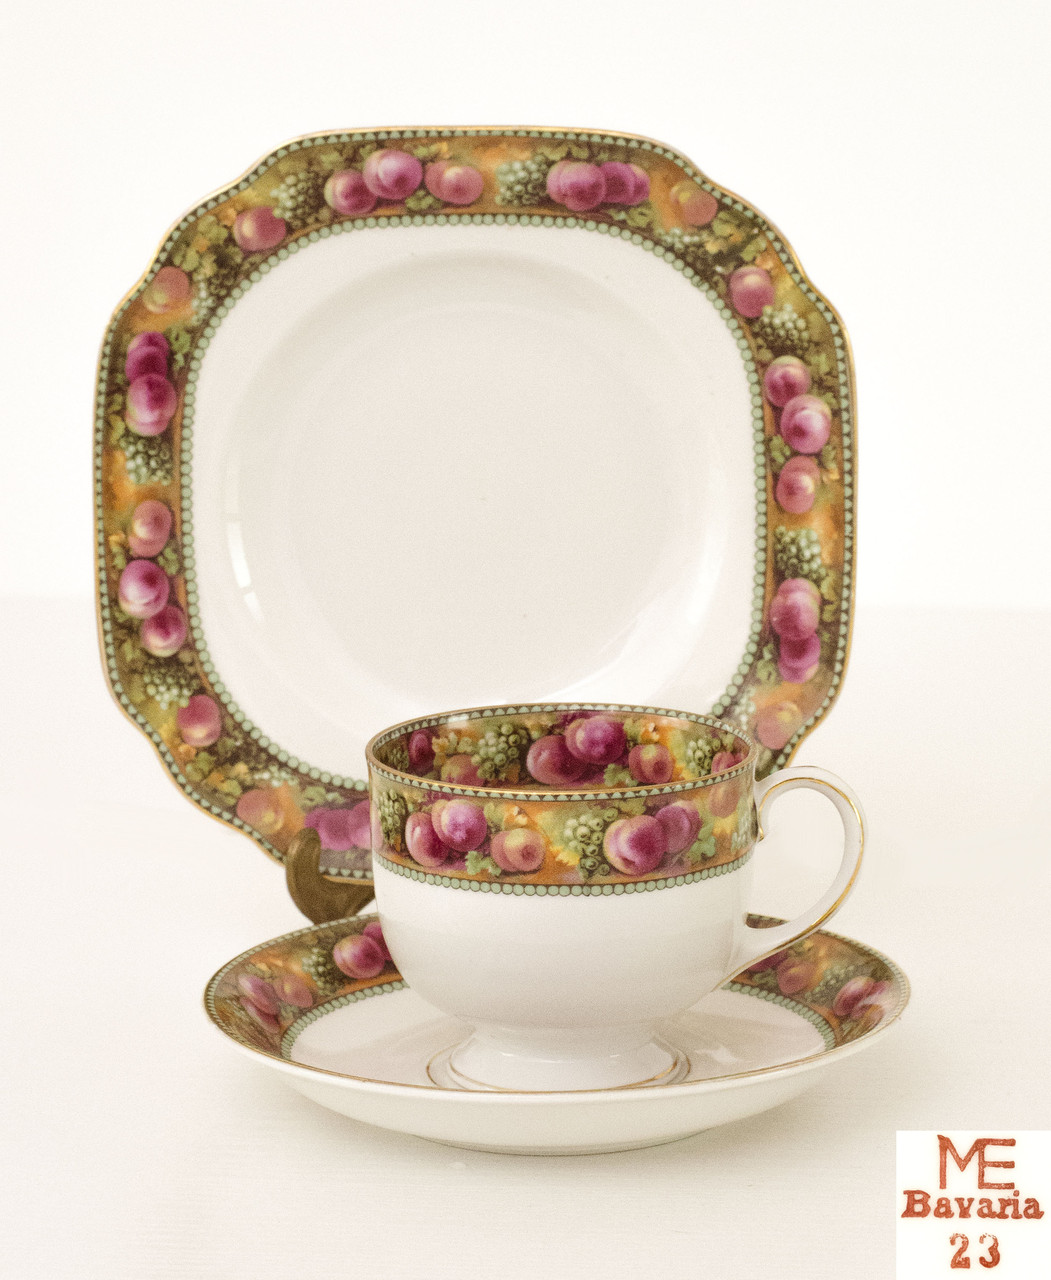 Чайная тройка, чашка, блюдце, тарелка, фарфор, Германия, Бовария